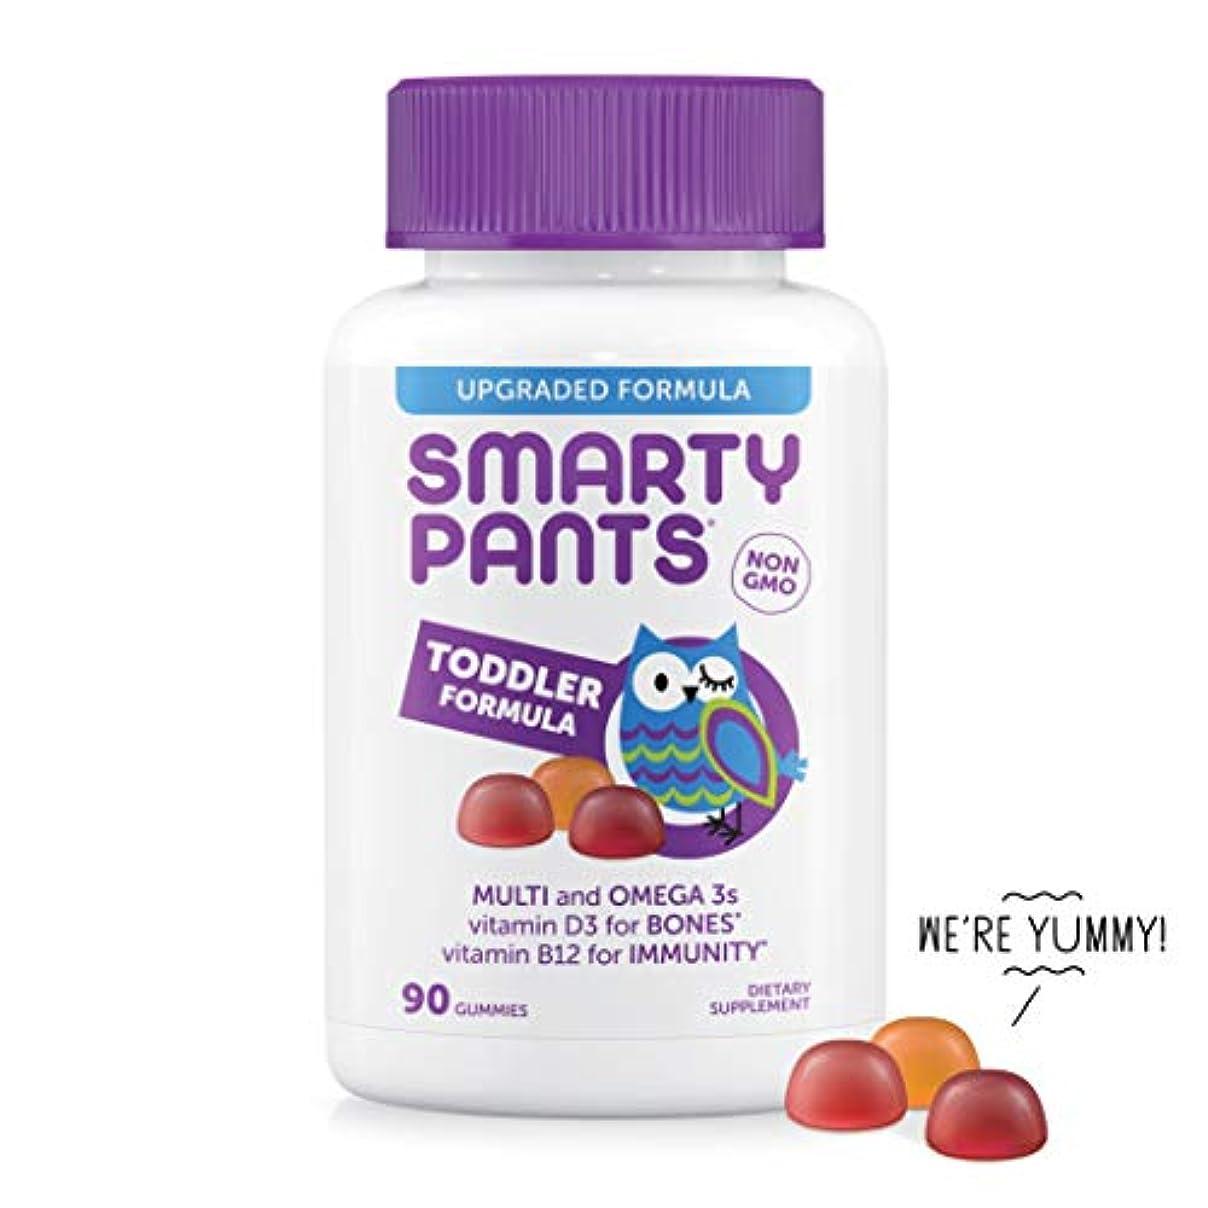 SmartyPants Toddler Formula Daily Gummy Vitamins: Gluten Free, Multivitamin & Omega 3 Fish Oil (DHA/EPA), Methyl B12, Vitamin D3, Vitamin B6, 90 Count (30 Day Supply) - Packaging May Vary gi71294469123